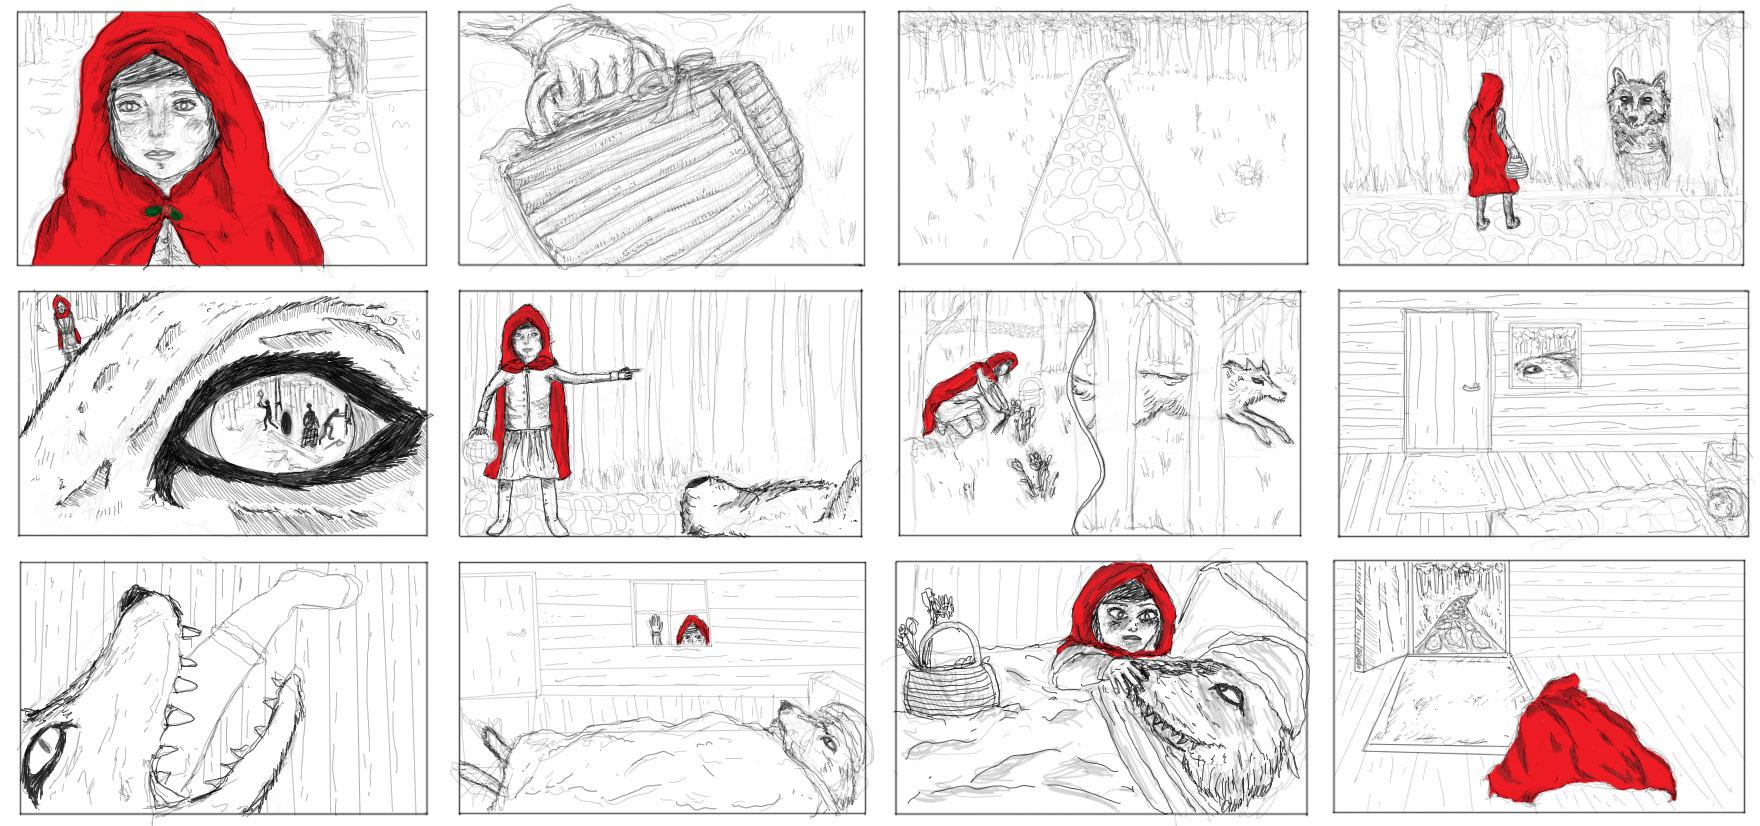 Little Red Riding Hood Brandon Nichols Git 210 230 Coursework